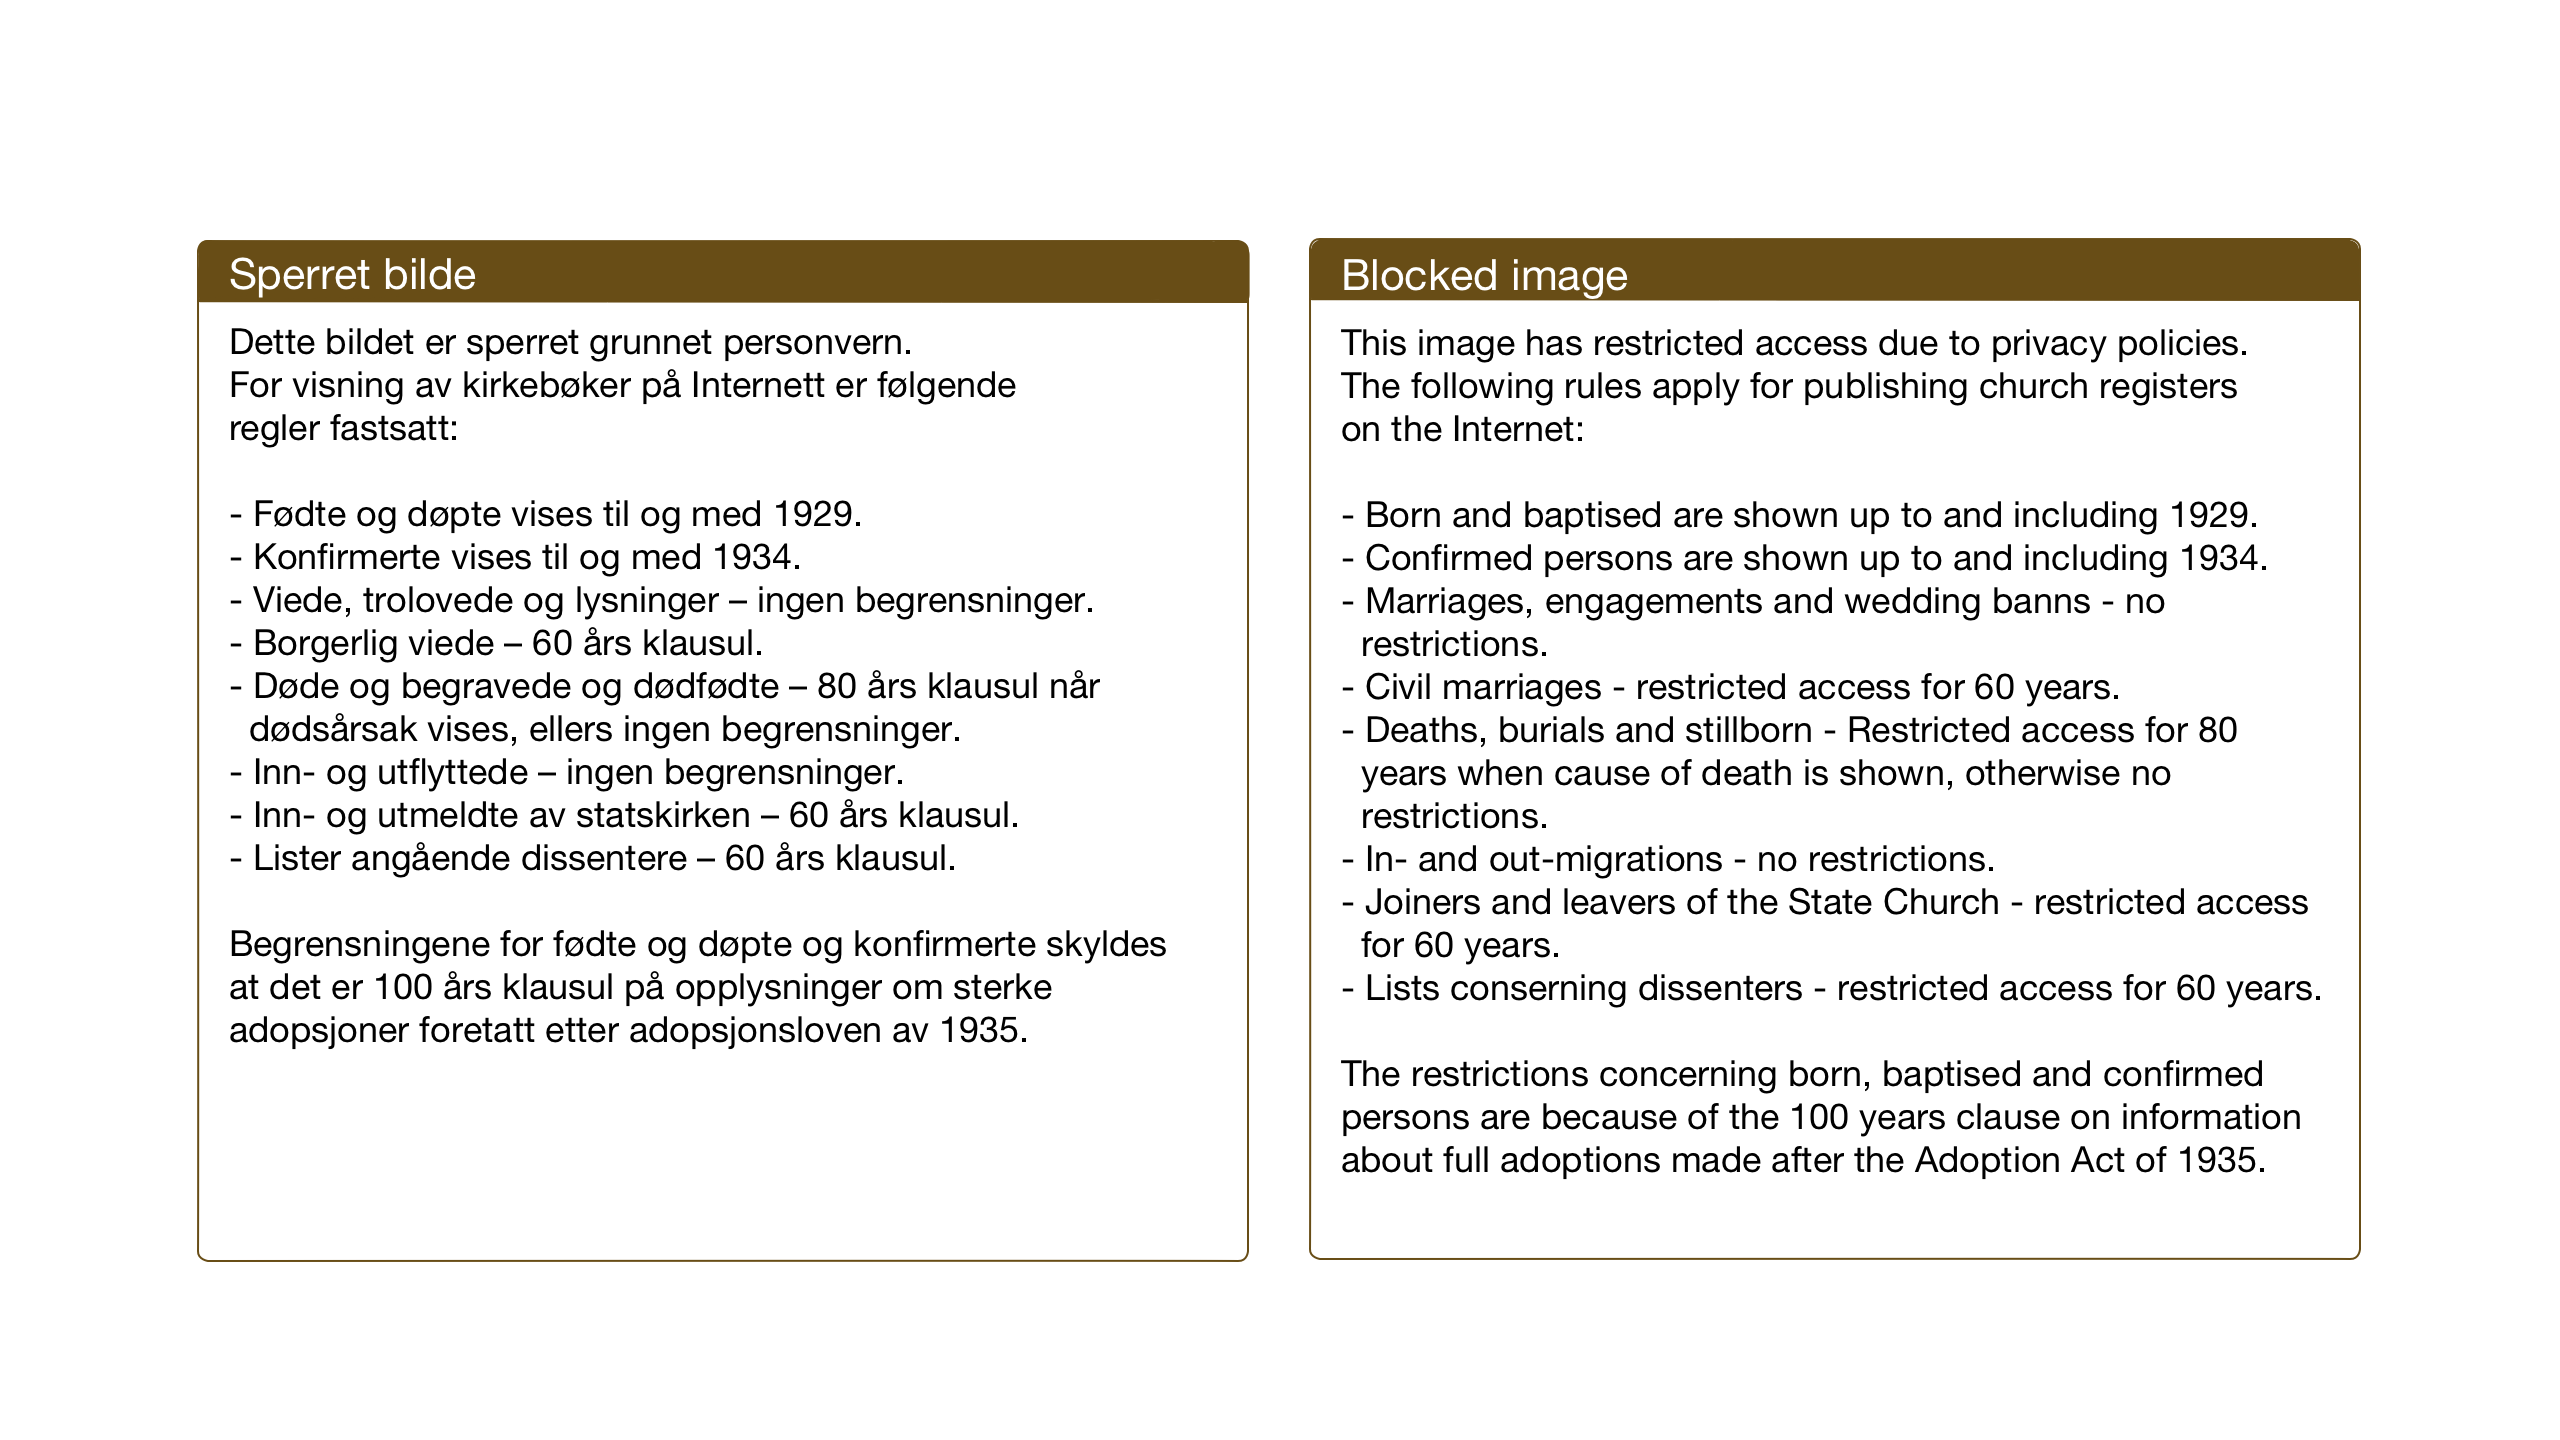 SAT, Ministerialprotokoller, klokkerbøker og fødselsregistre - Nordland, 847/L0680: Klokkerbok nr. 847C08, 1930-1947, s. 60